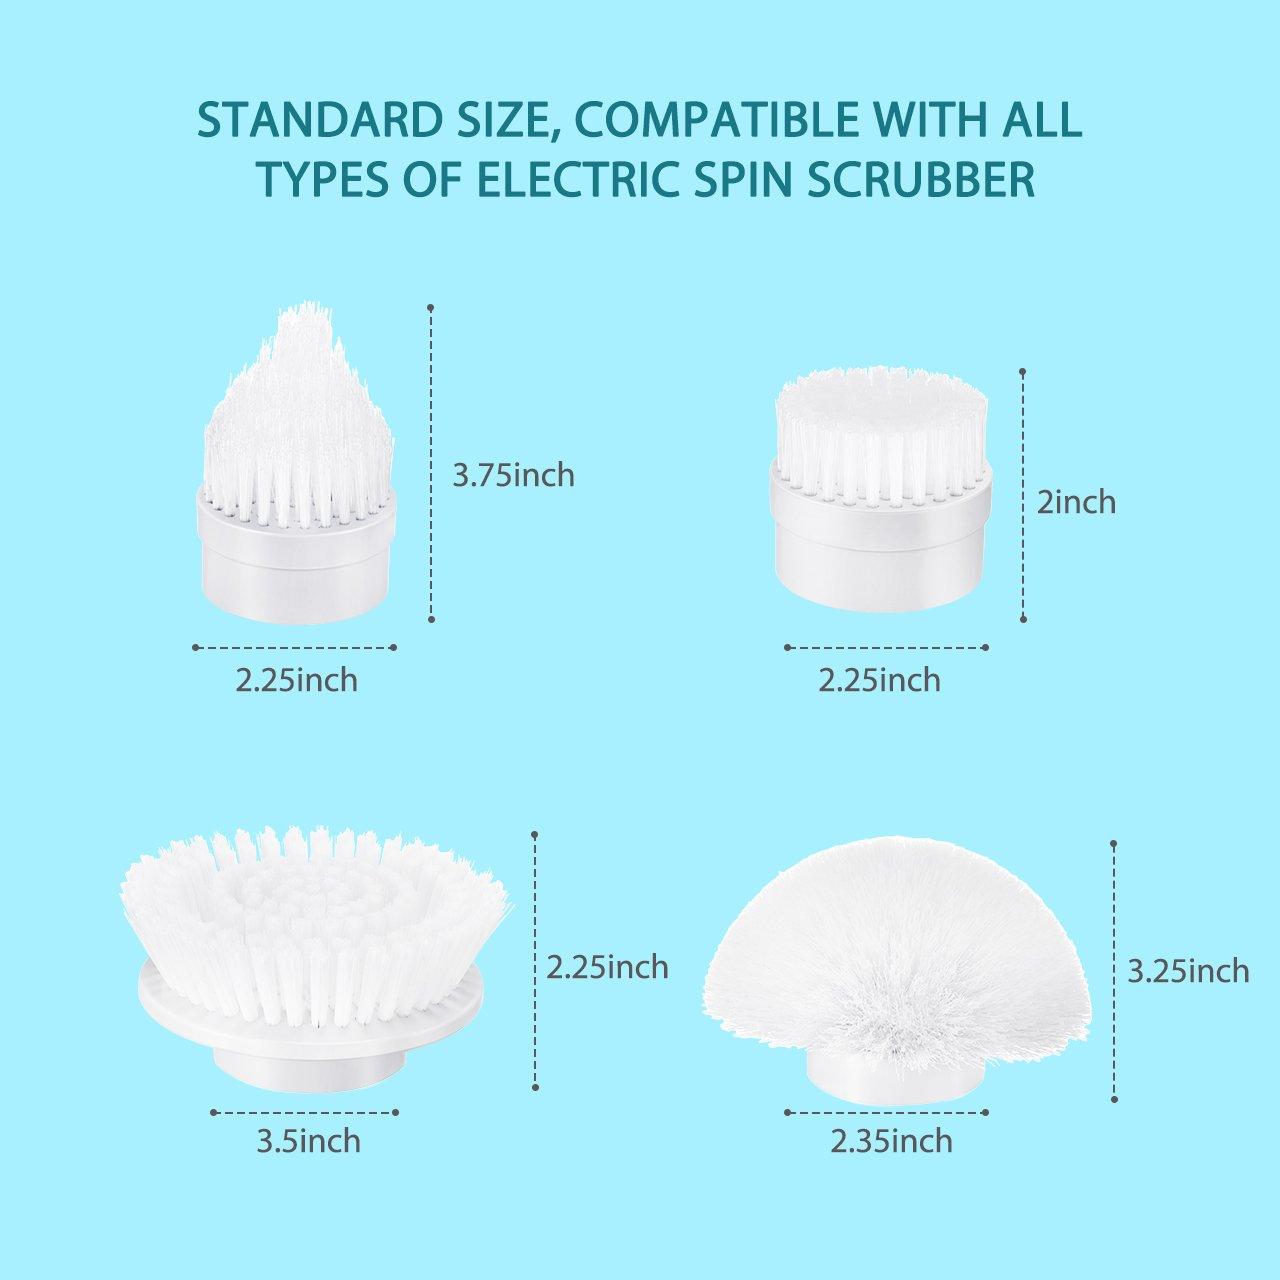 Amazon.com: Homitt 4pcs Power Spin Scrubber Replacement Brush Heads ...